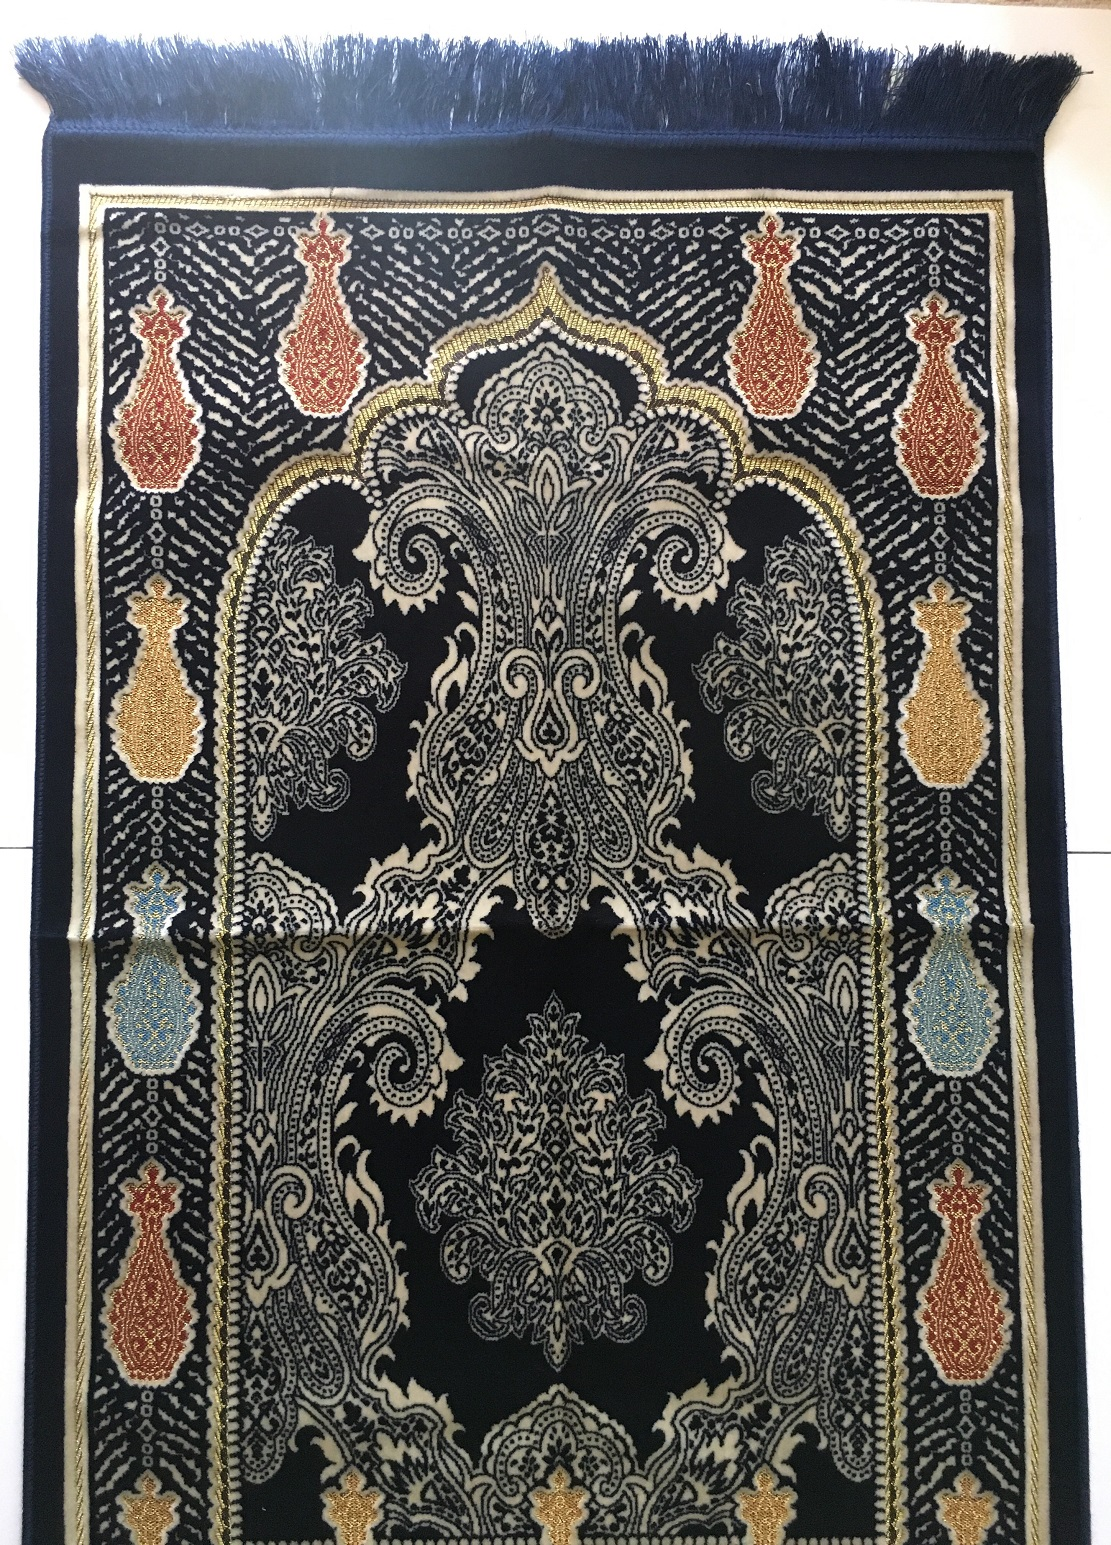 Luxury Paisley Design Turkish Prayer Rug Navy Amp Gold The